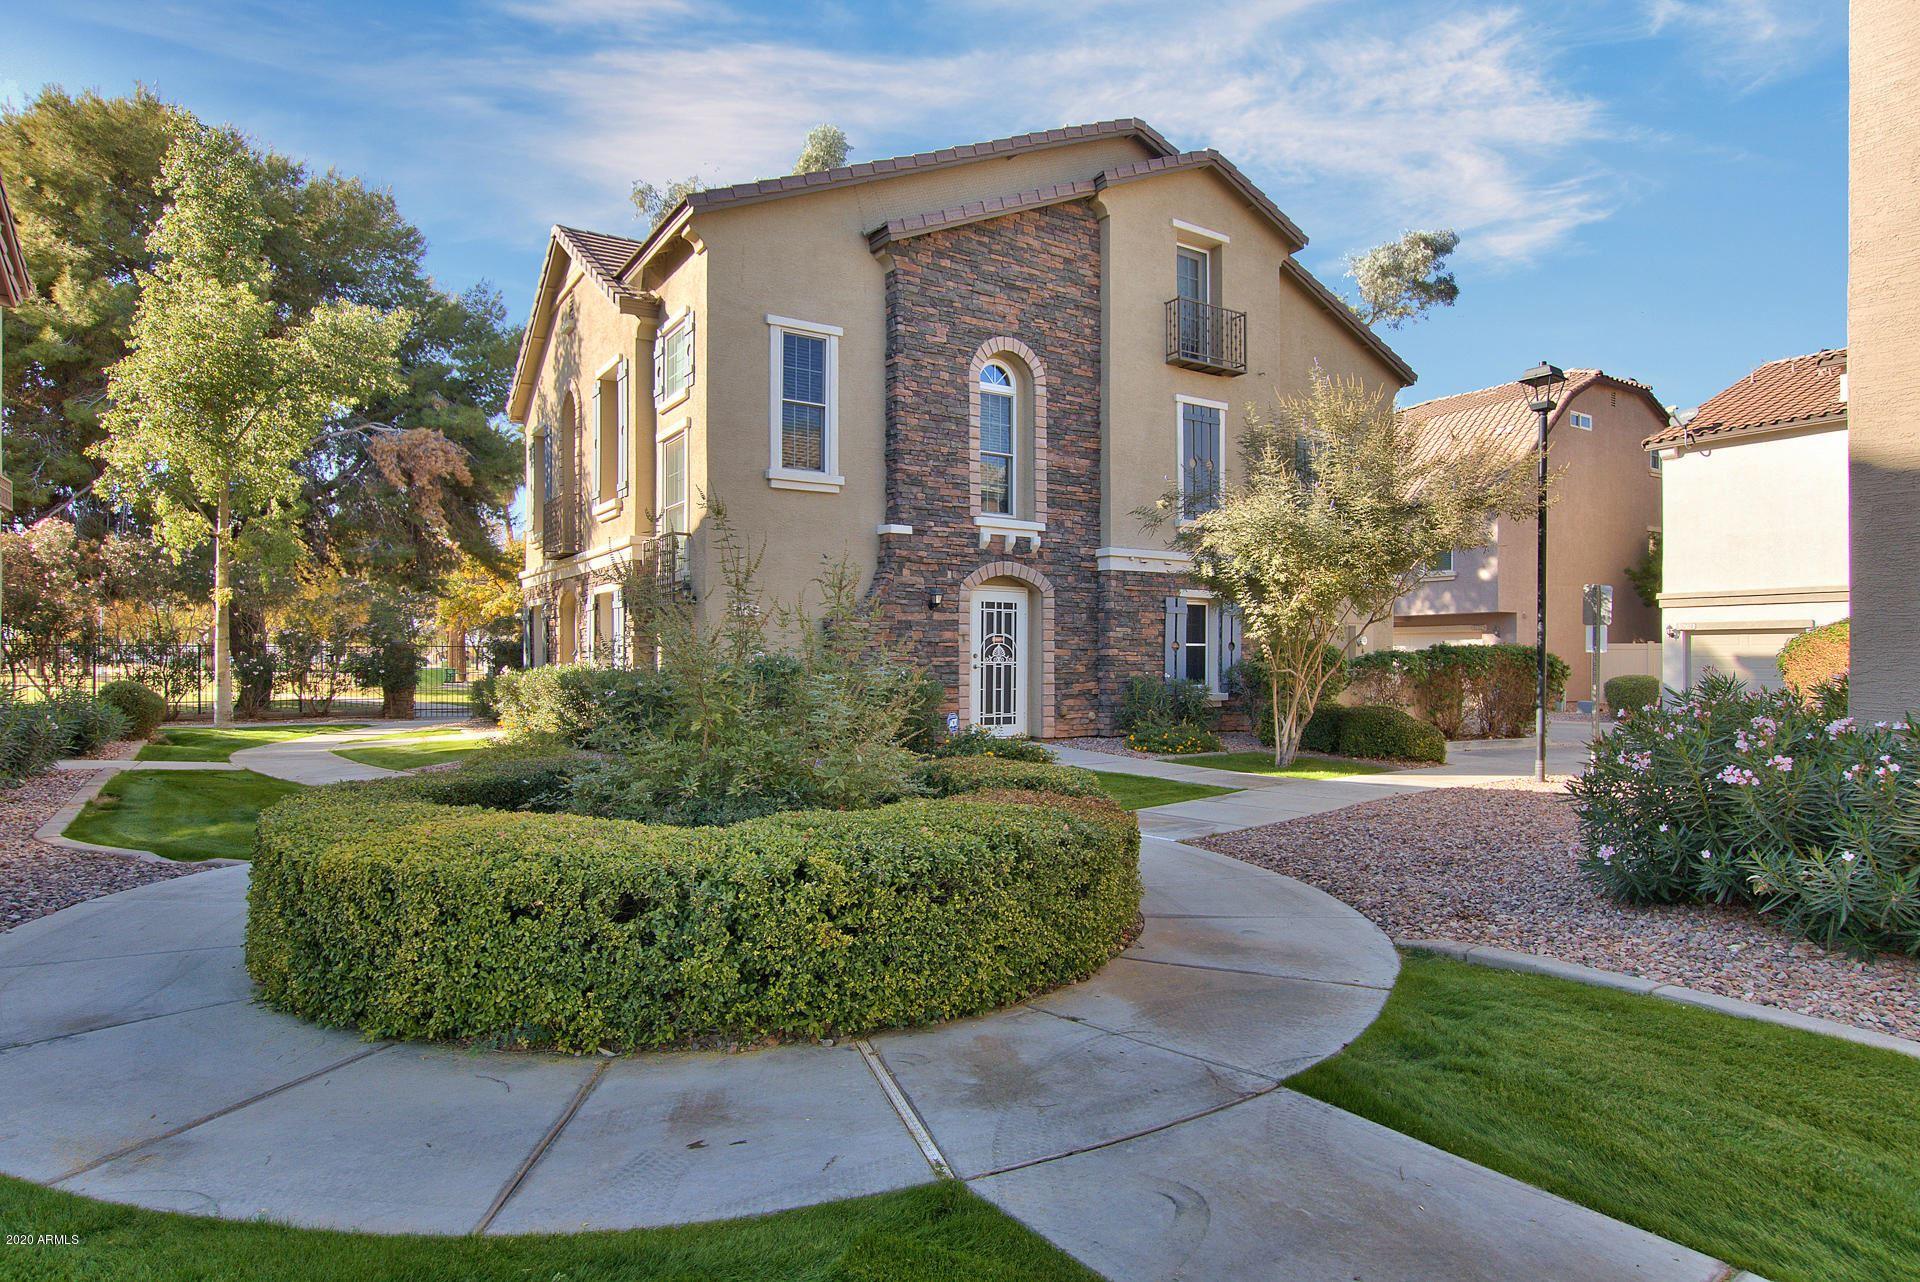 5734 S 21ST Place, Phoenix, AZ 85040 - MLS#: 6164985